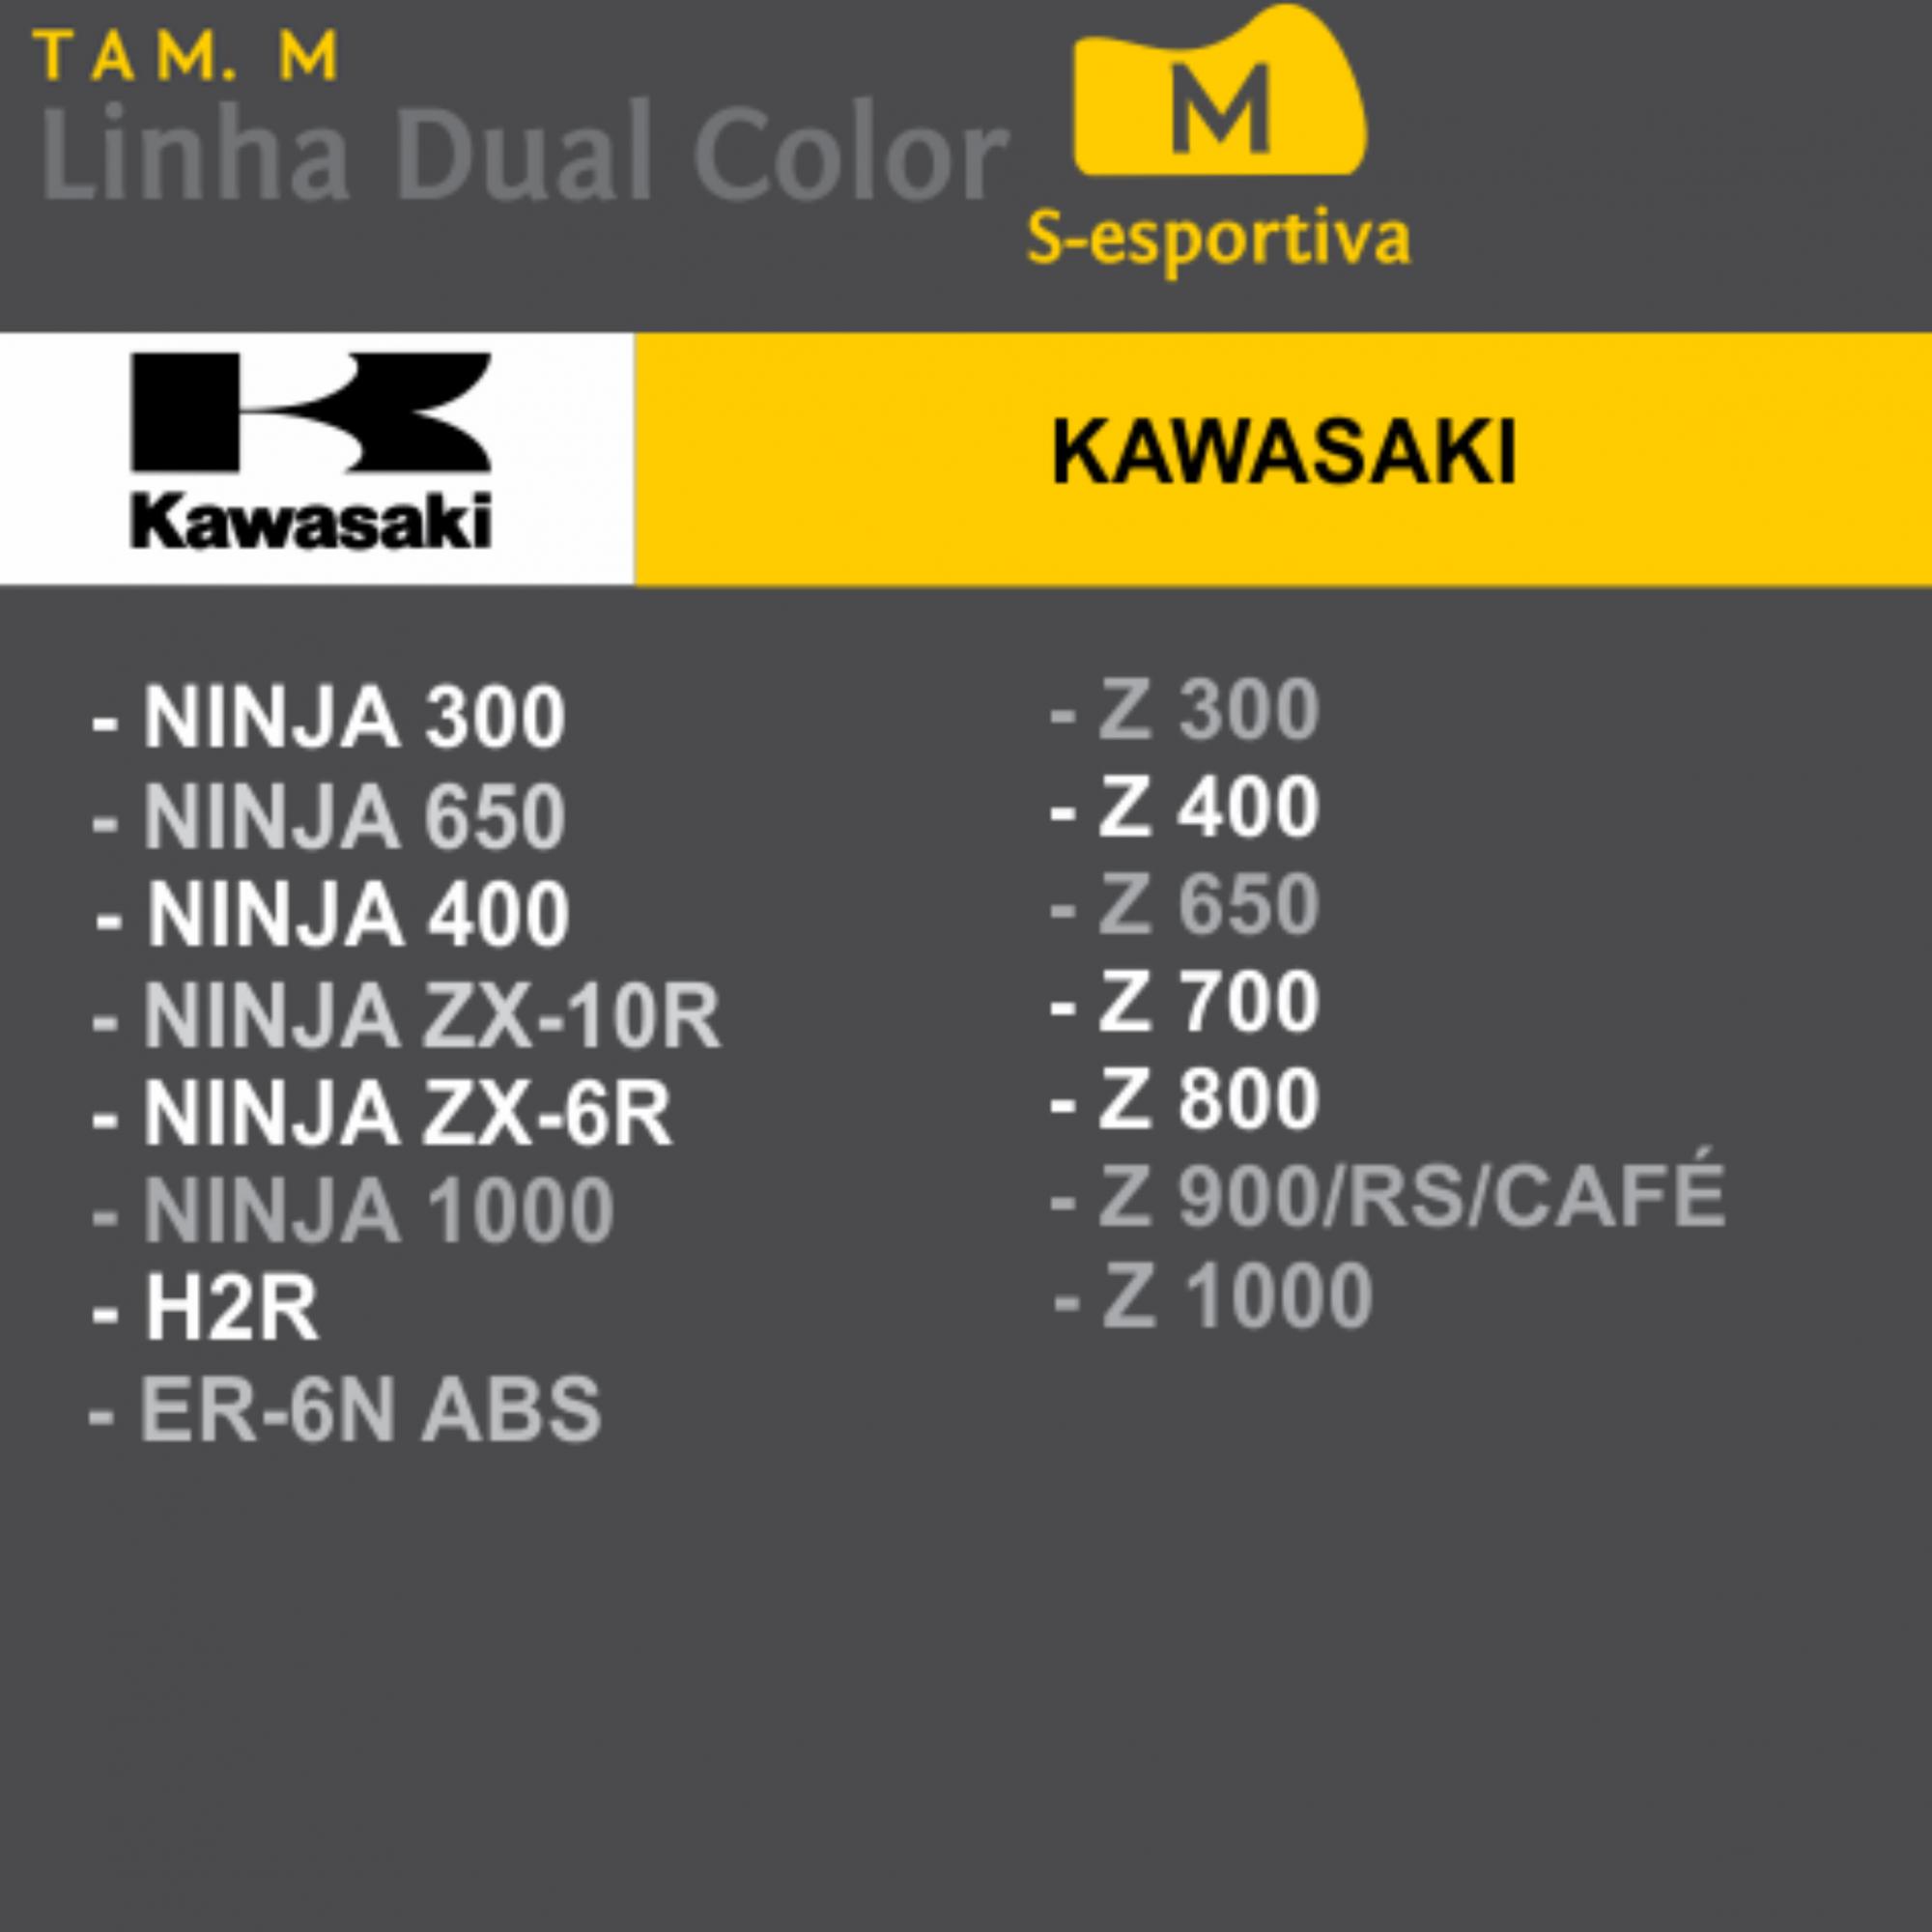 Capa Para Moto SuperBike Kawasaki Tam. M (permeavel)